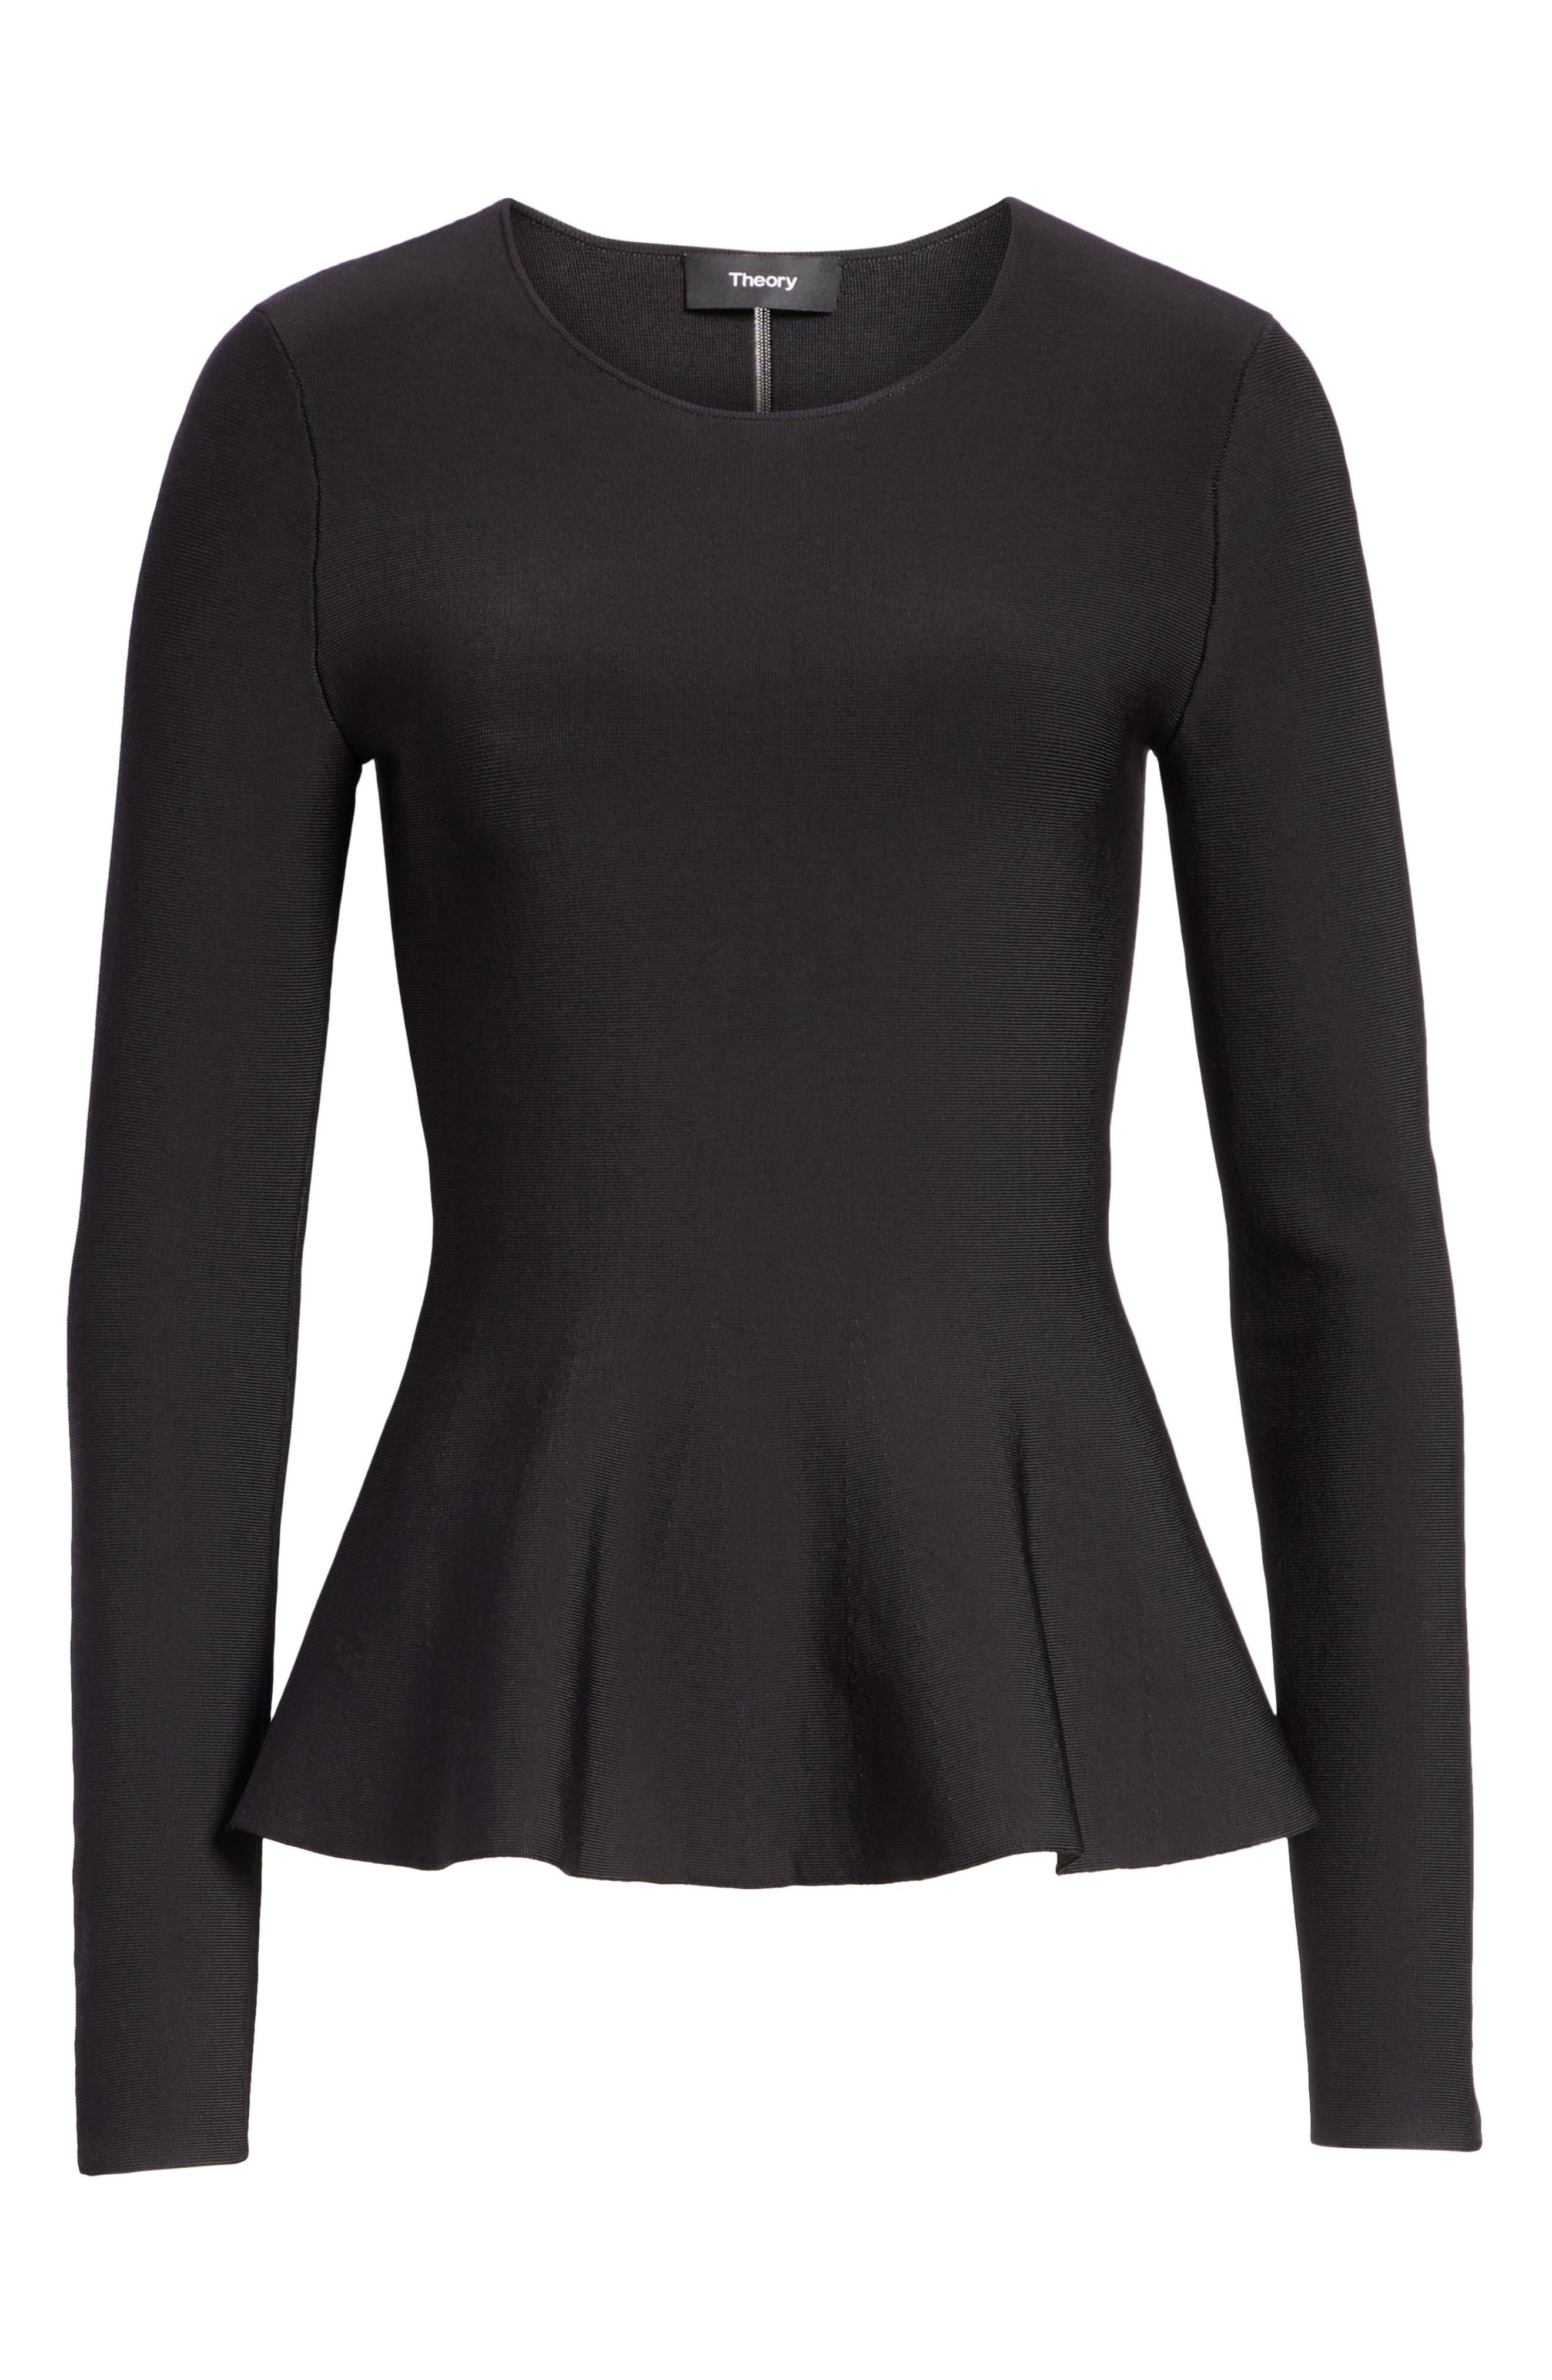 Glossed Peplum Sweater,                             Alternate thumbnail 6, color,                             BLACK